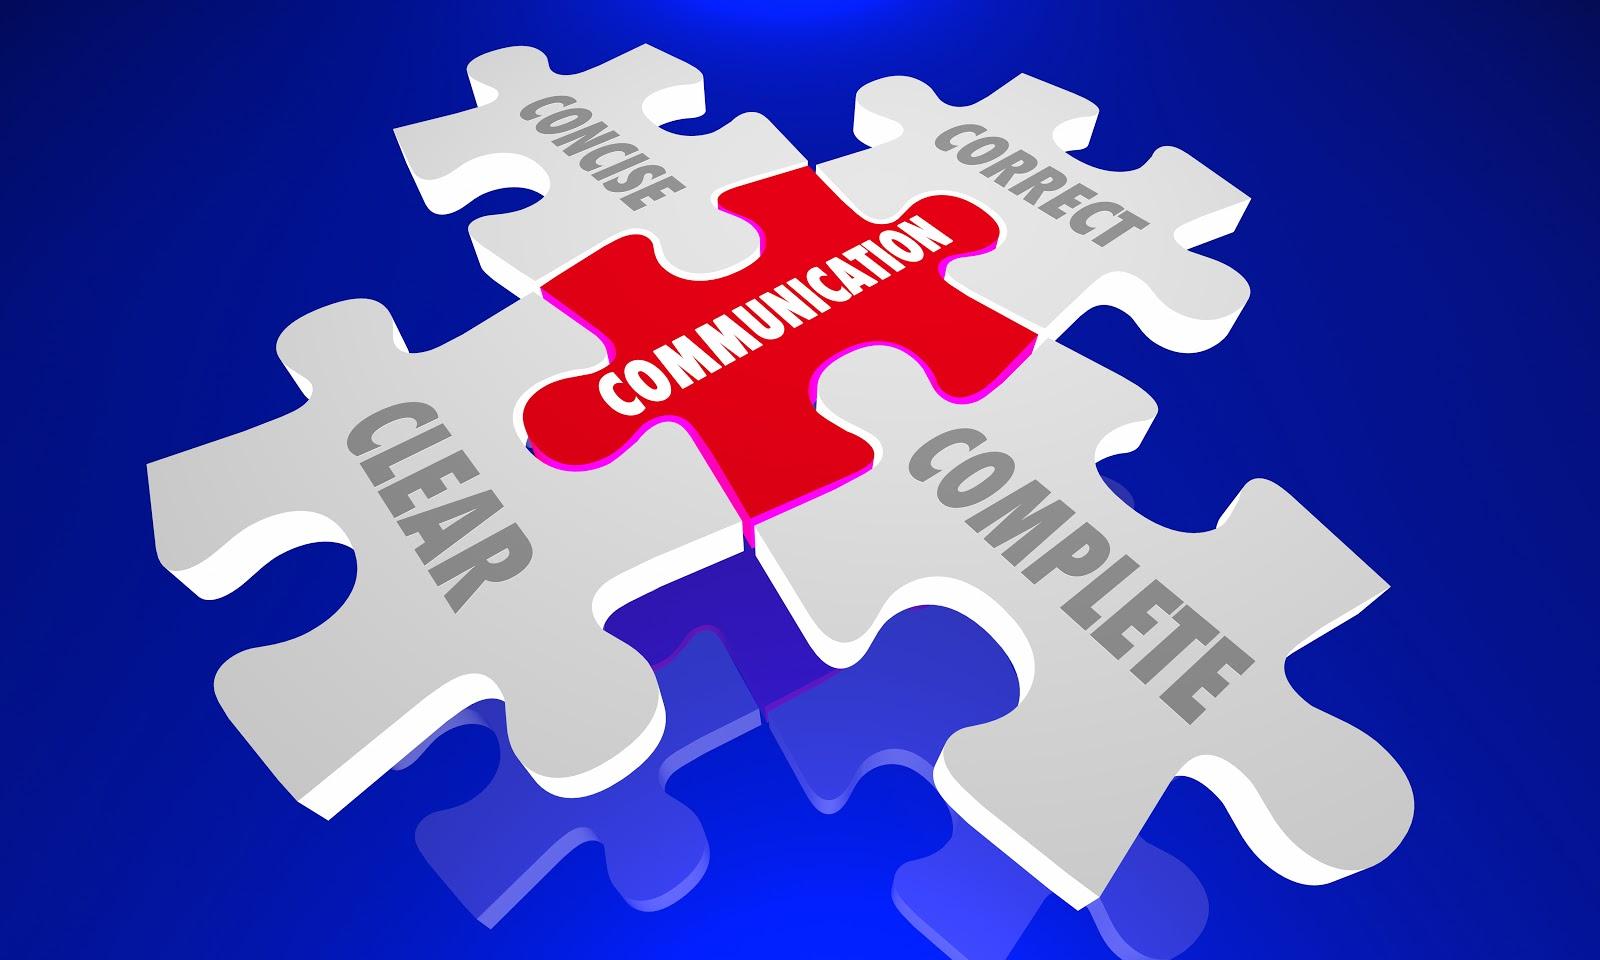 Puzzle showing good communication principles